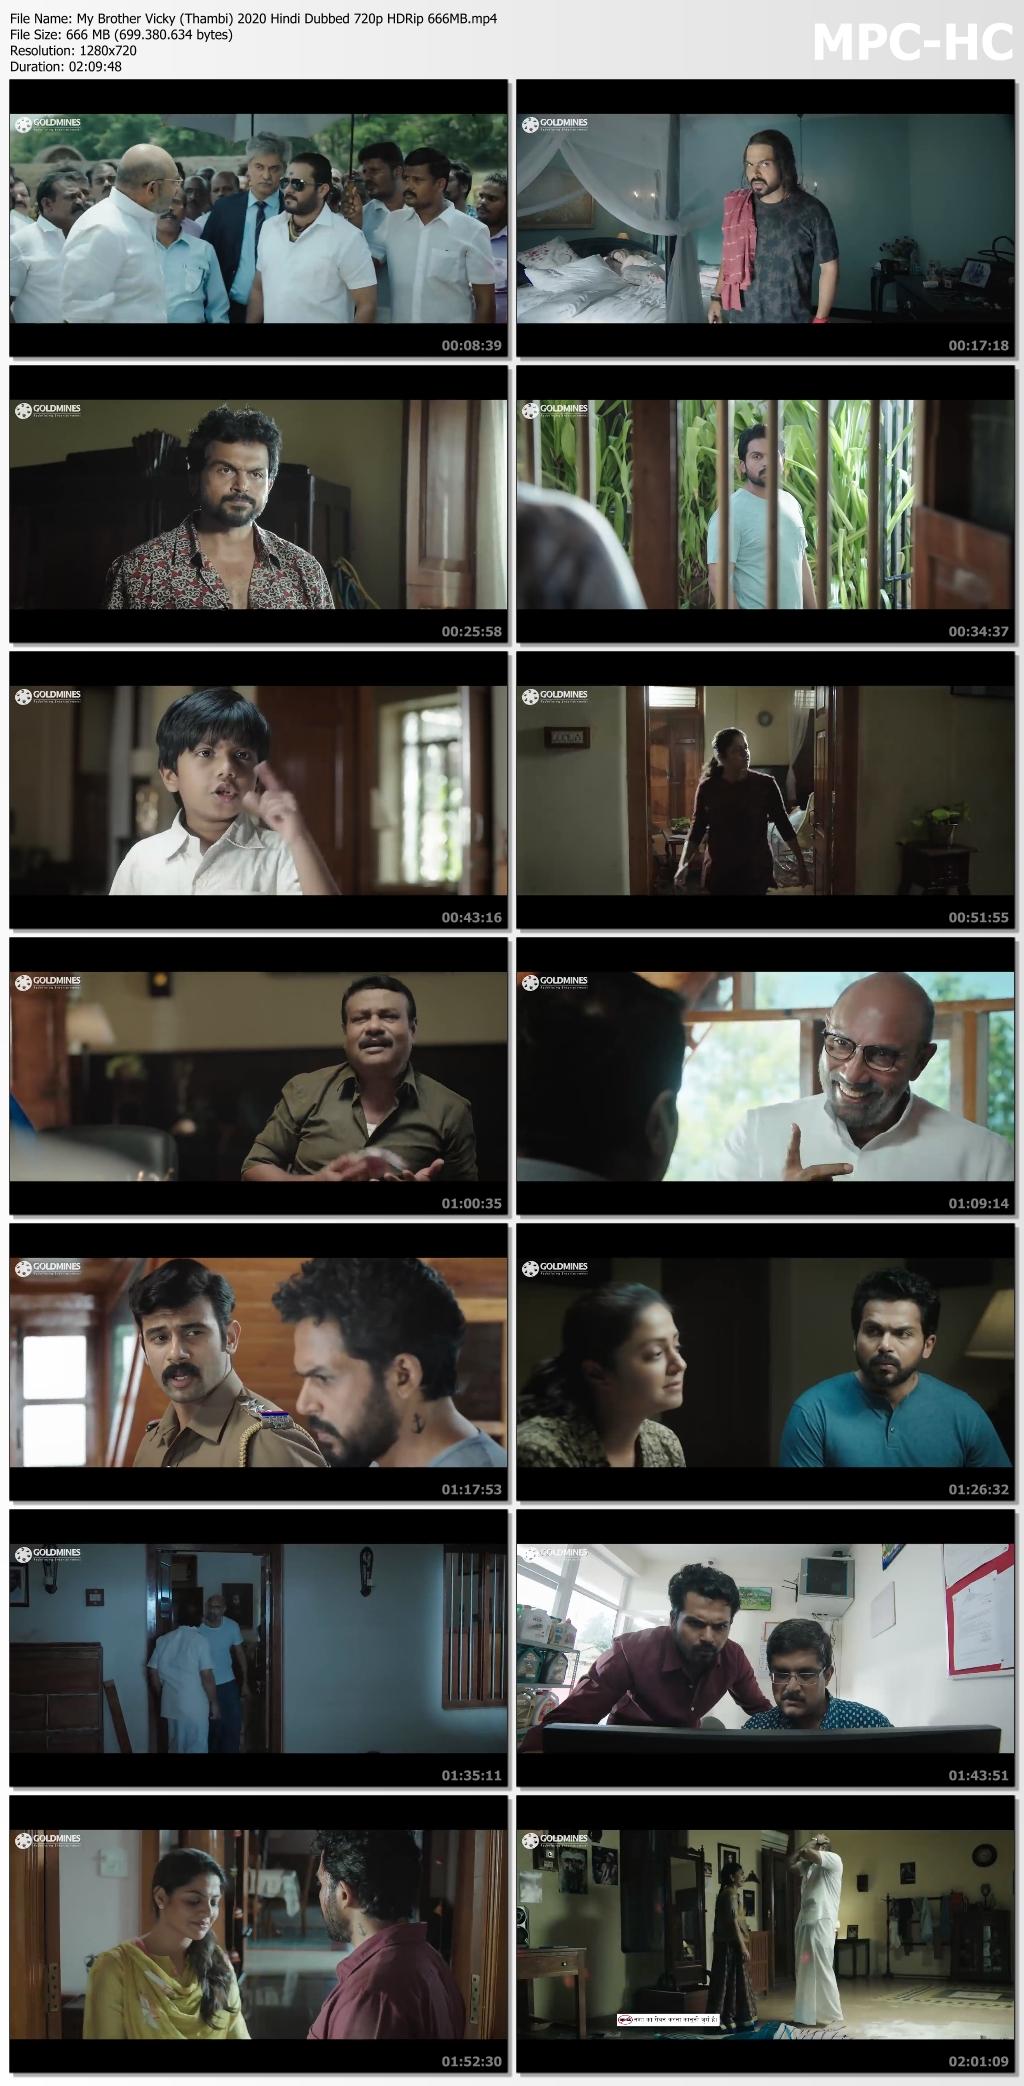 My-Brother-Vicky-Thambi-2020-Hindi-Dubbed-720p-HDRip-666-MB-mp4-thumbs